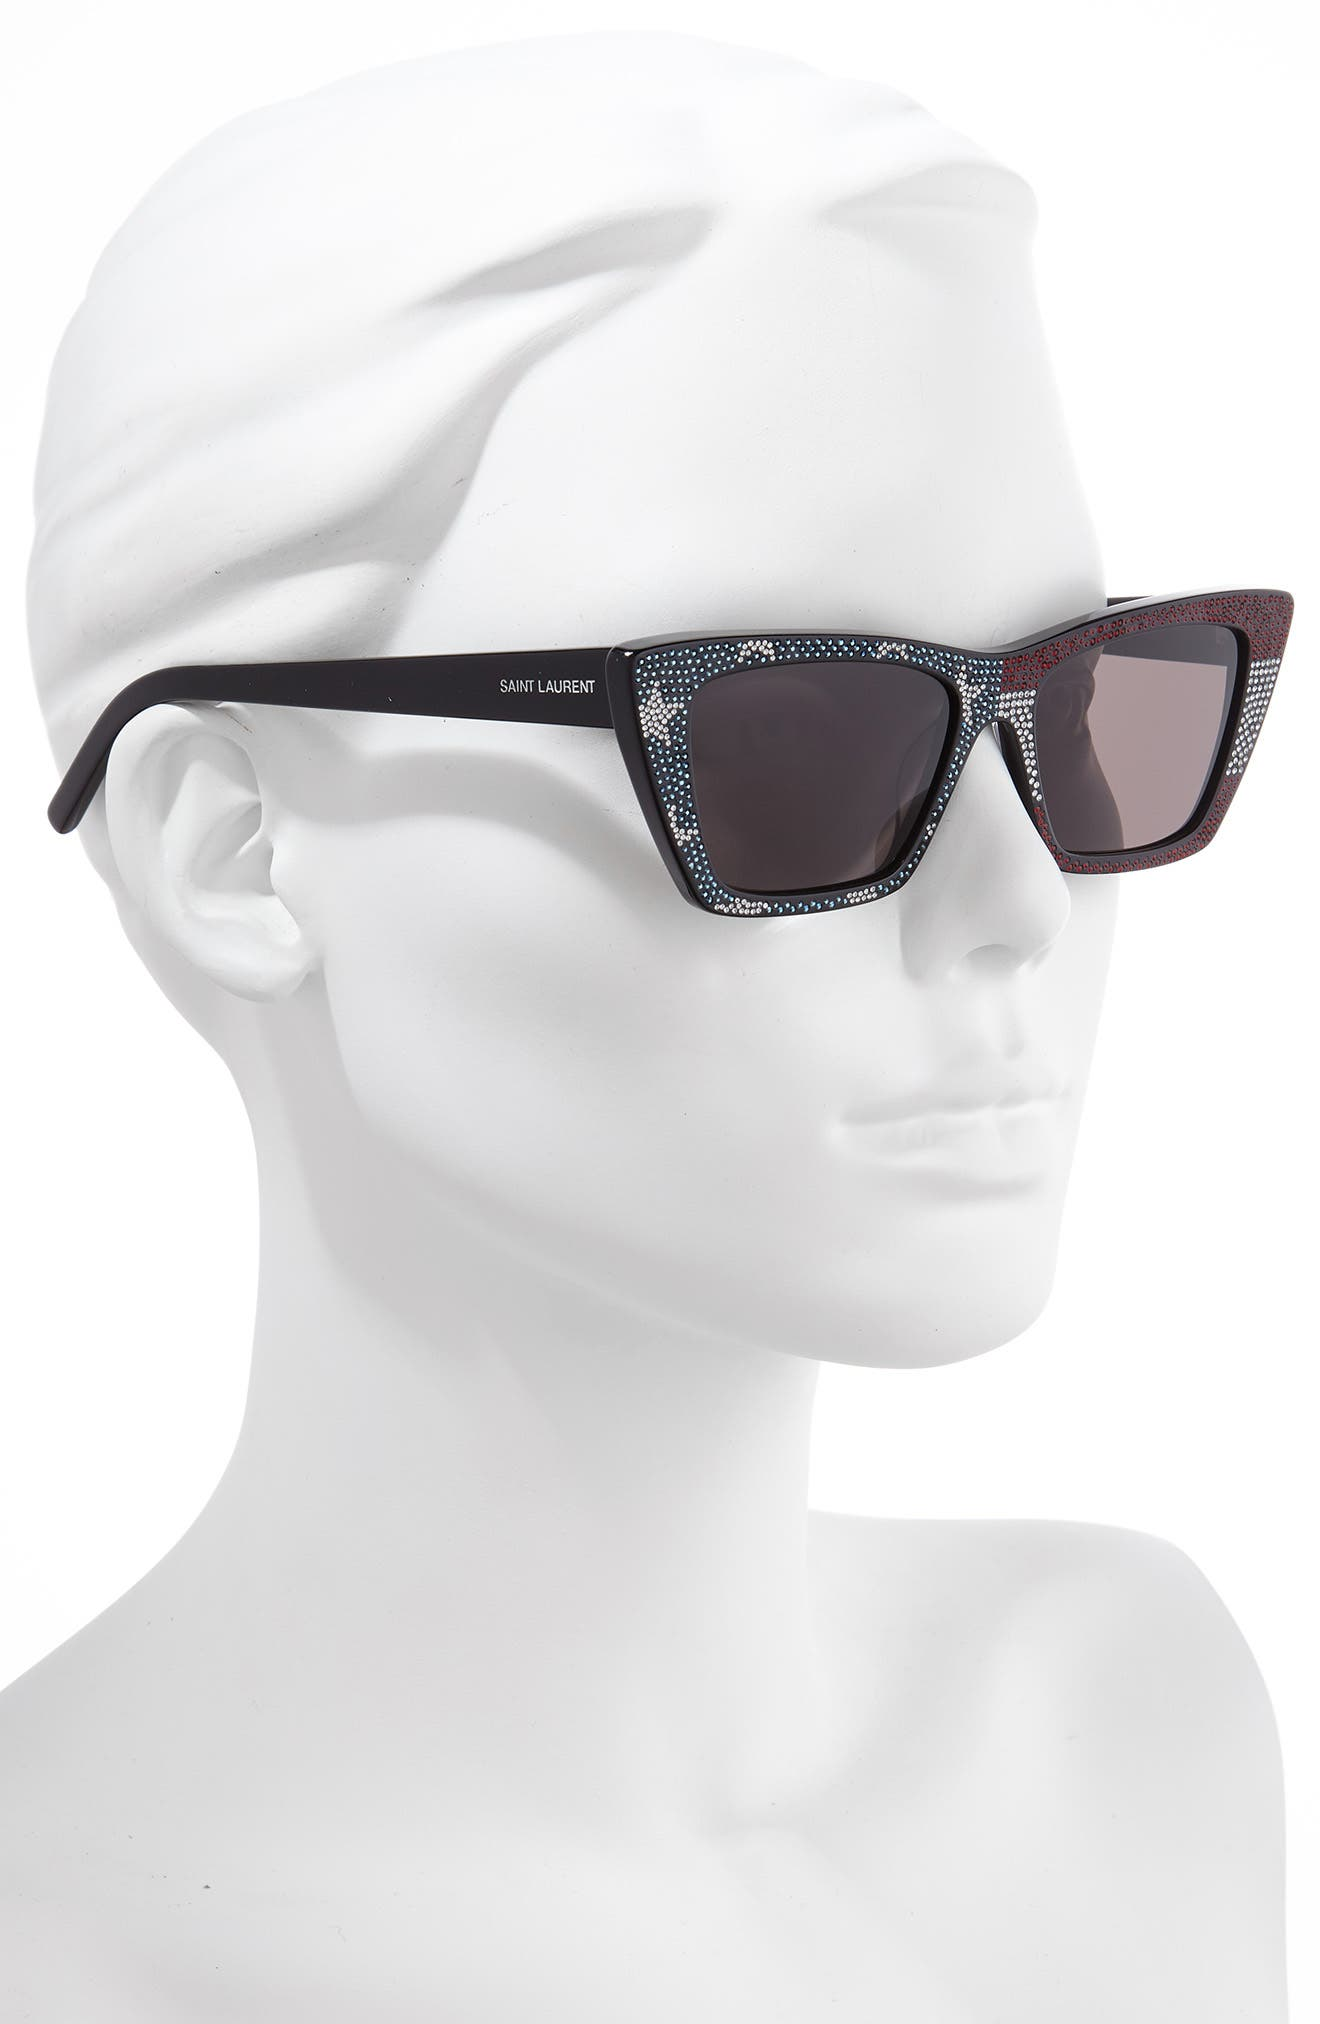 SAINT LAURENT, 53mm Cat Eye Sunglasses, Alternate thumbnail 2, color, BLACK/ CRYSTAL RED BLUE/ GREY